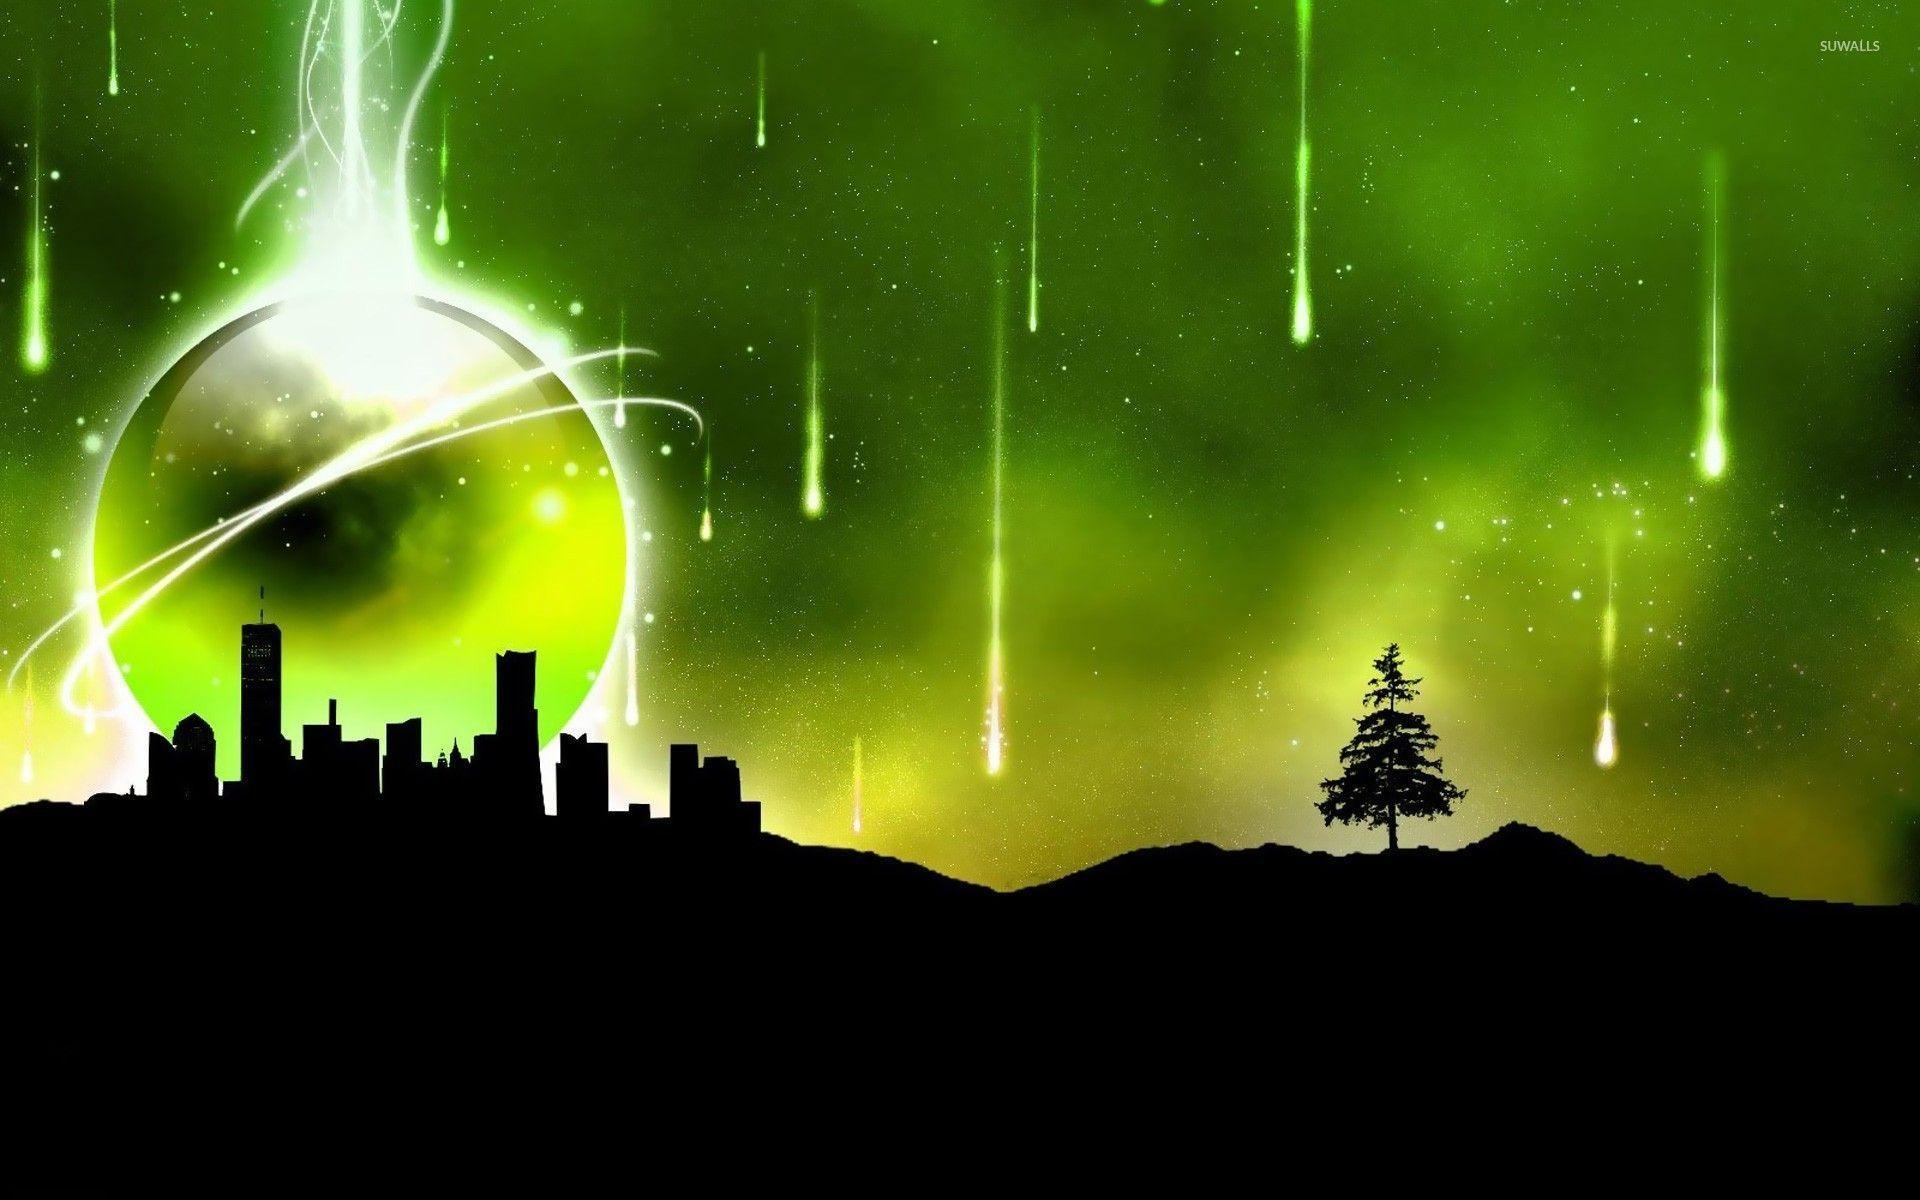 Meteor shower over the city wallpaper - Digital Art wallpapers ...